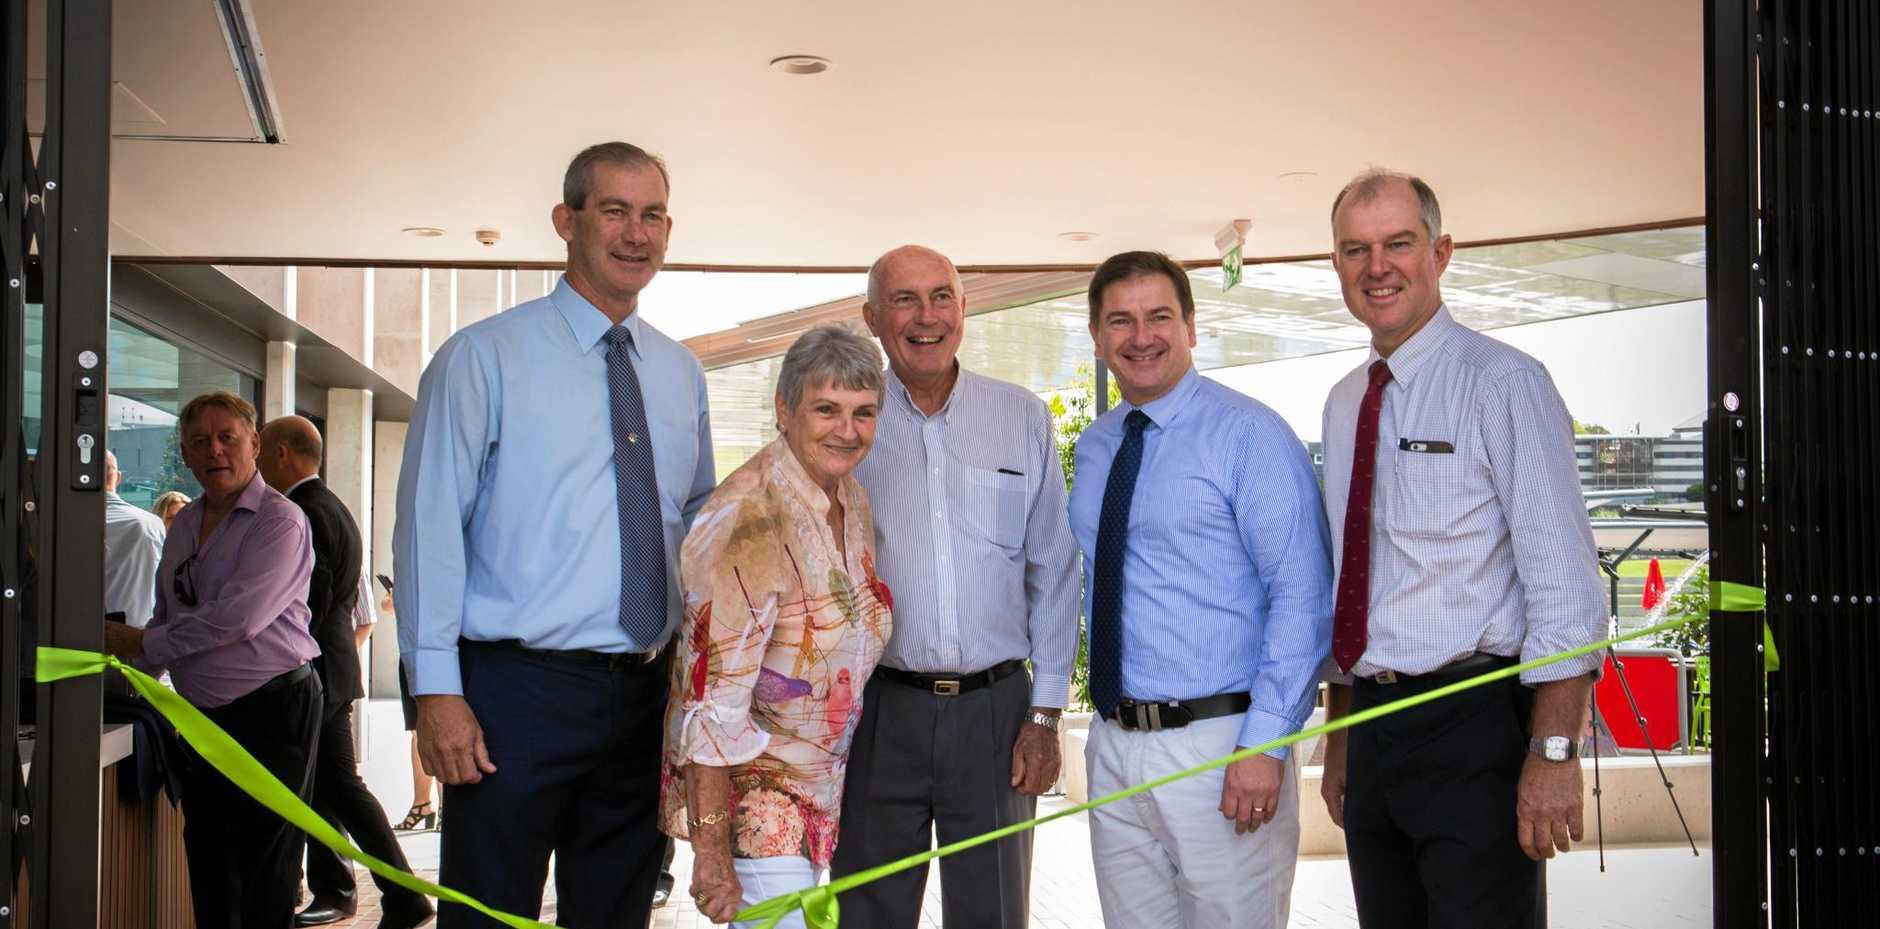 Mick Curran, Dulcie Dyne, Warren Truss, Llew O'Brien and Tony Perrett cut the ribbon at the Gympie Aquatic Recreation Centre.